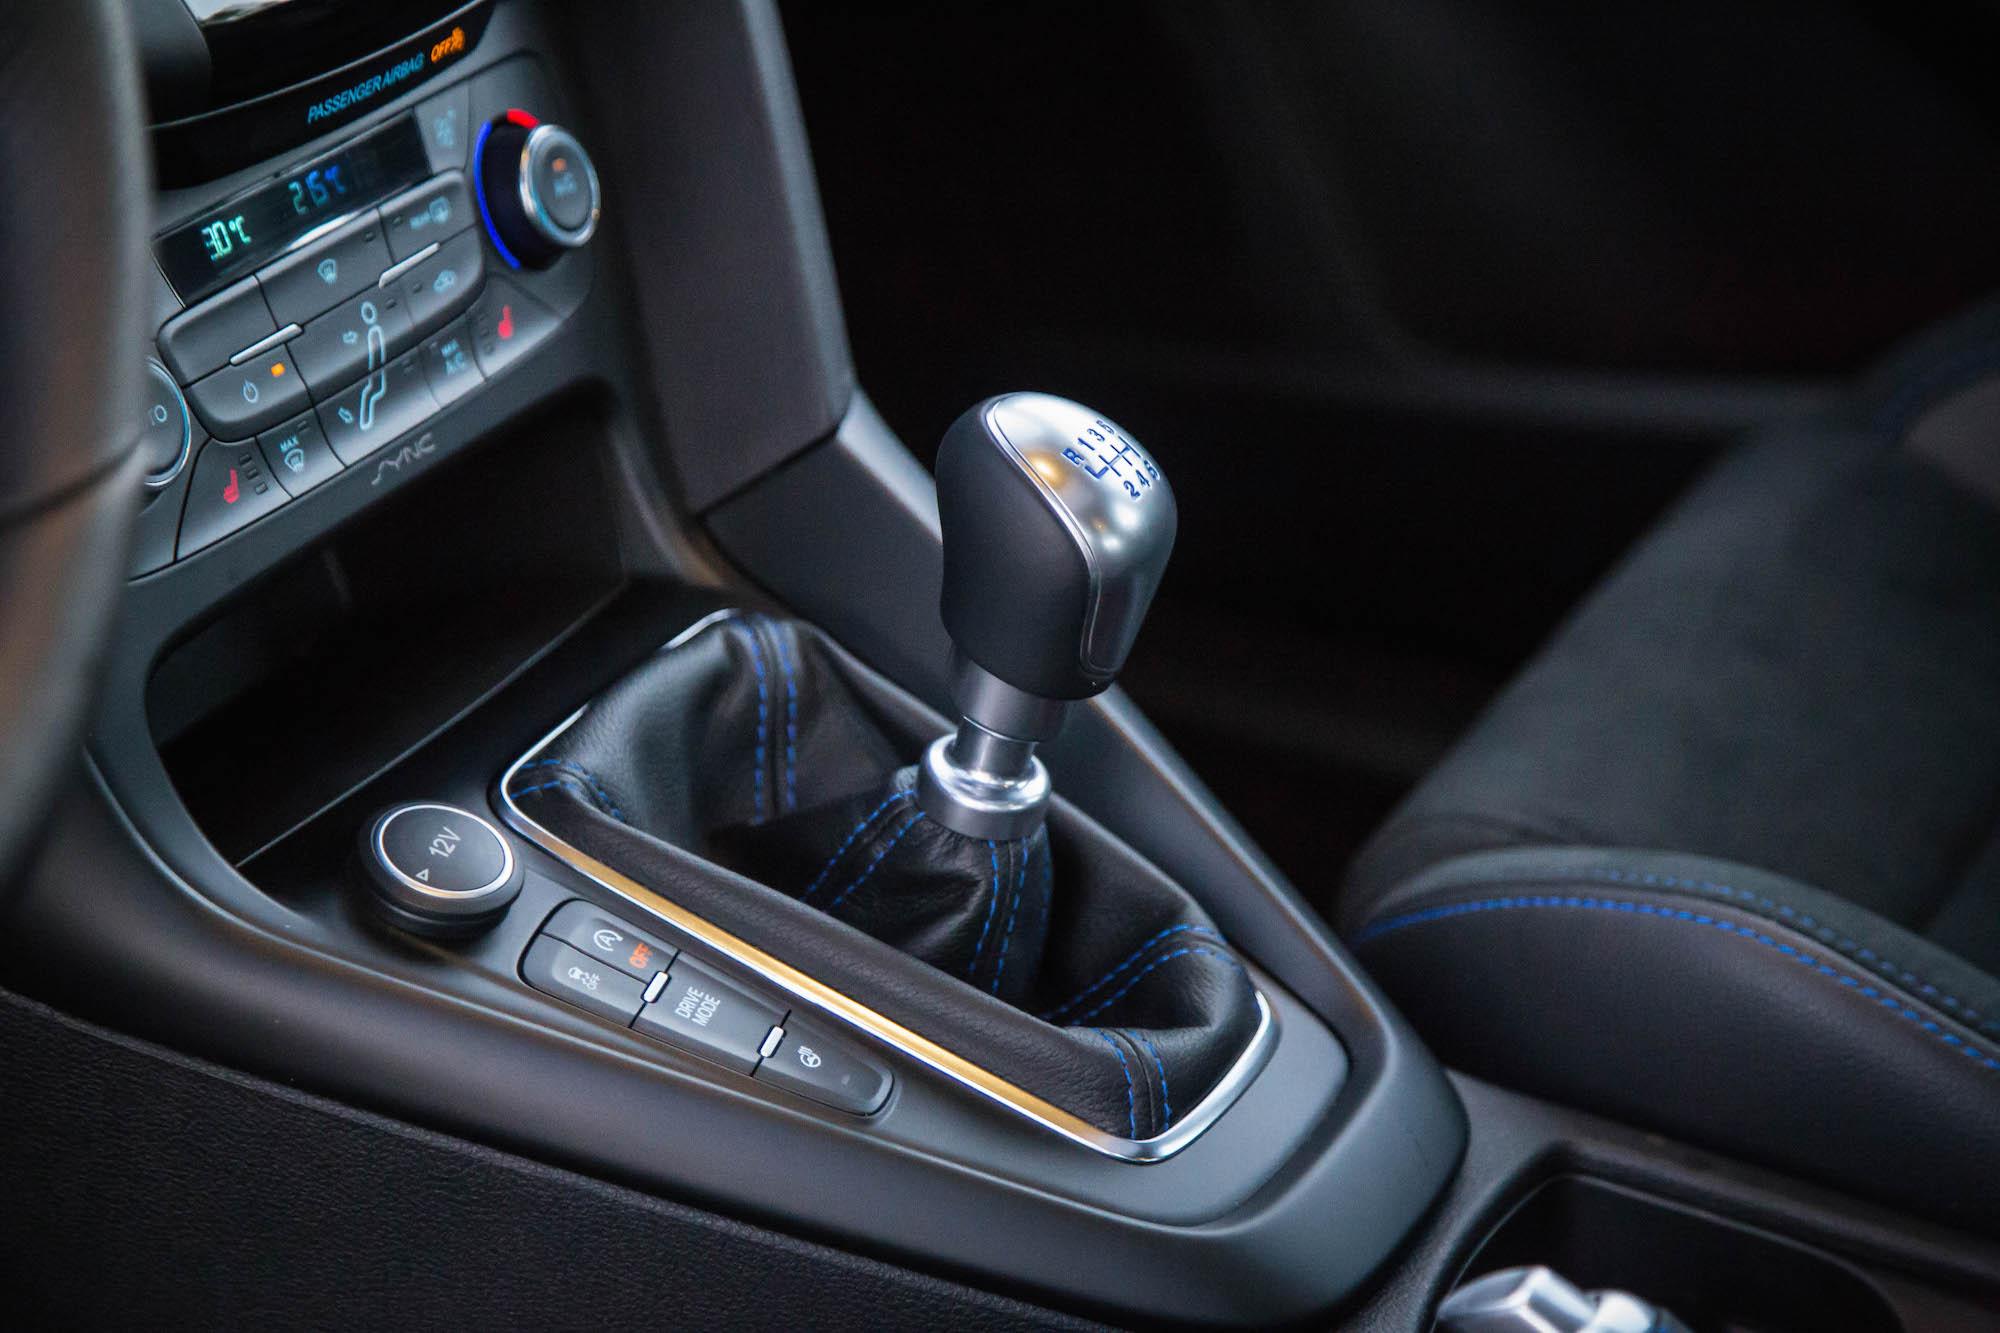 ford-focus-rs-gear-shifter.jpg